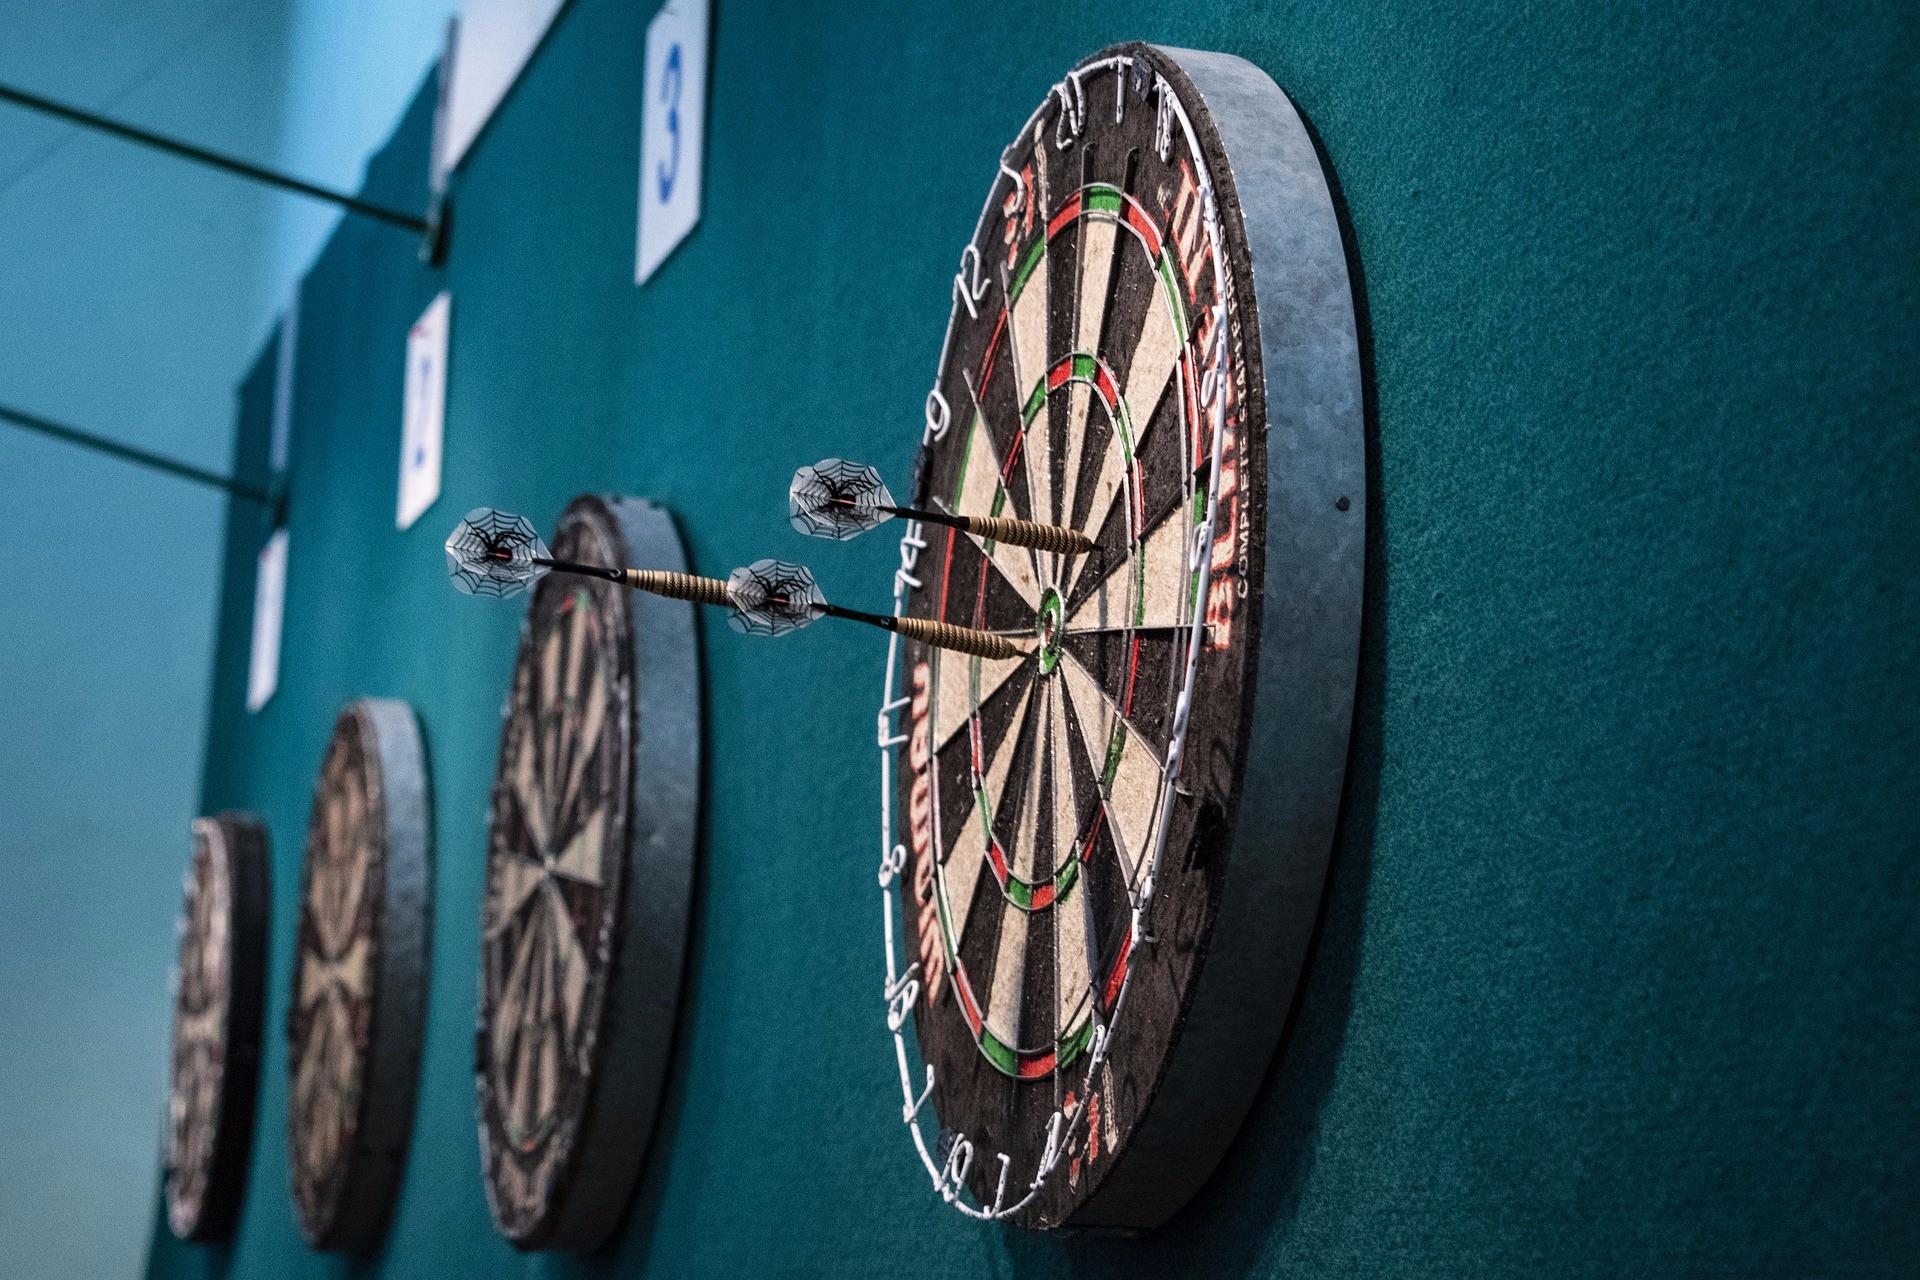 darts-4610860_1920.jpg